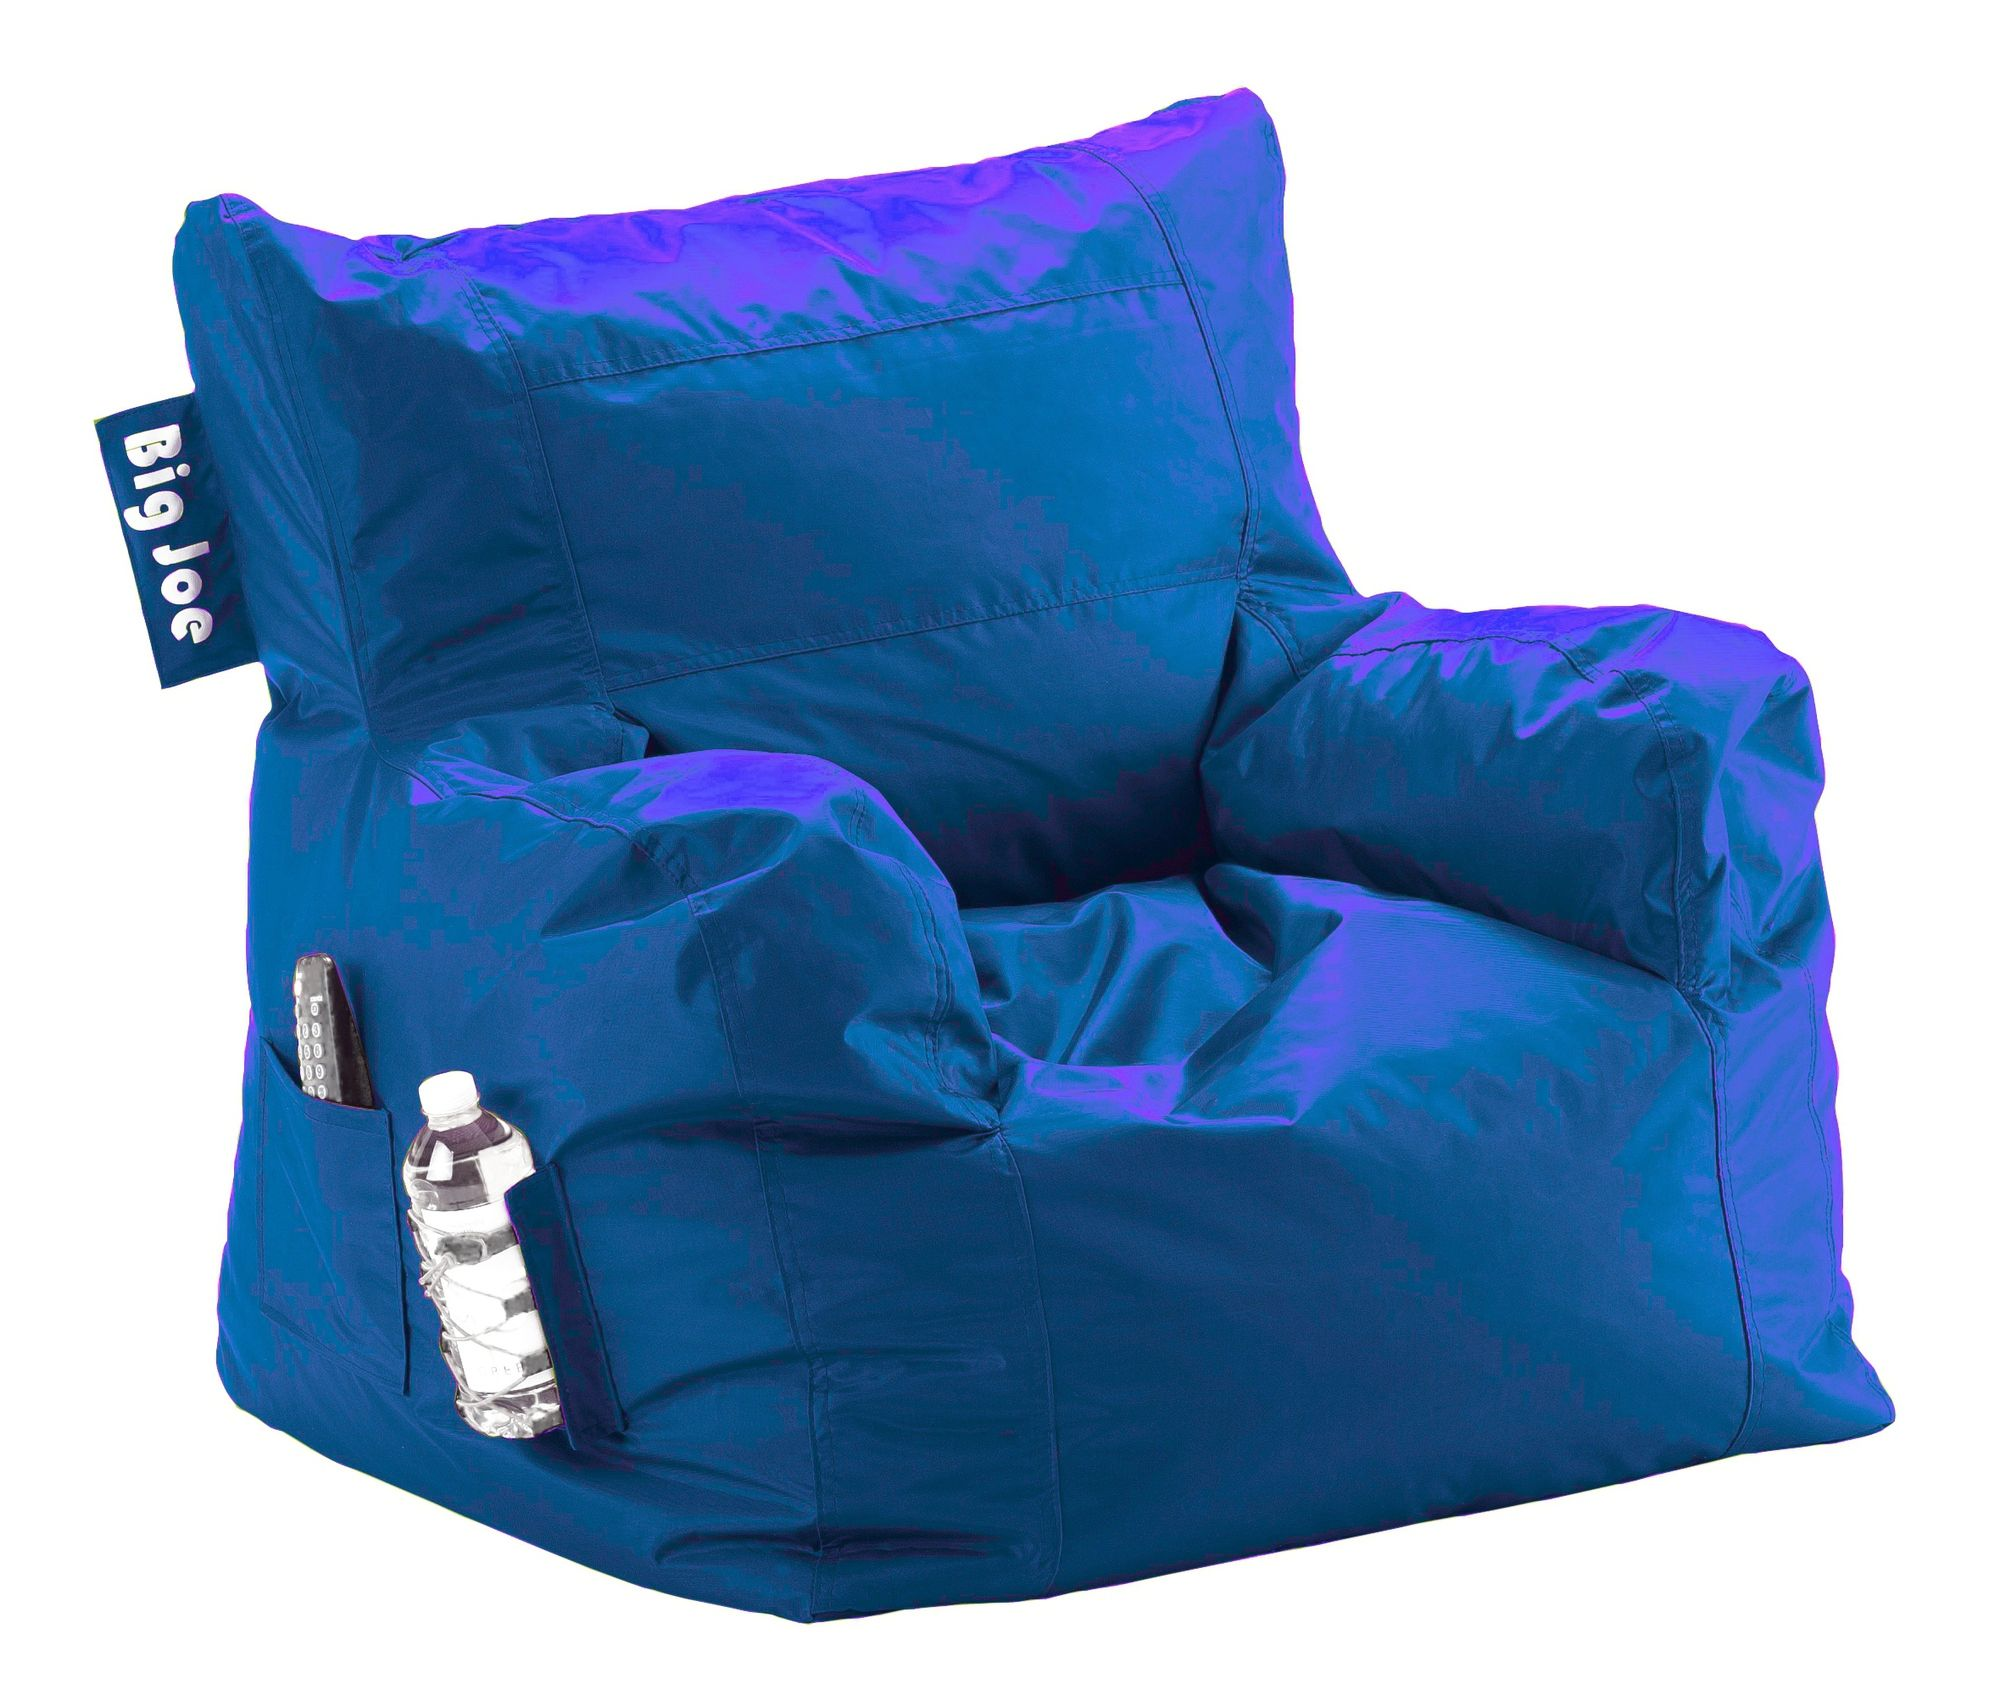 Comfort Research Big Joe Dorm Bean Bag Chair Dorm chairs